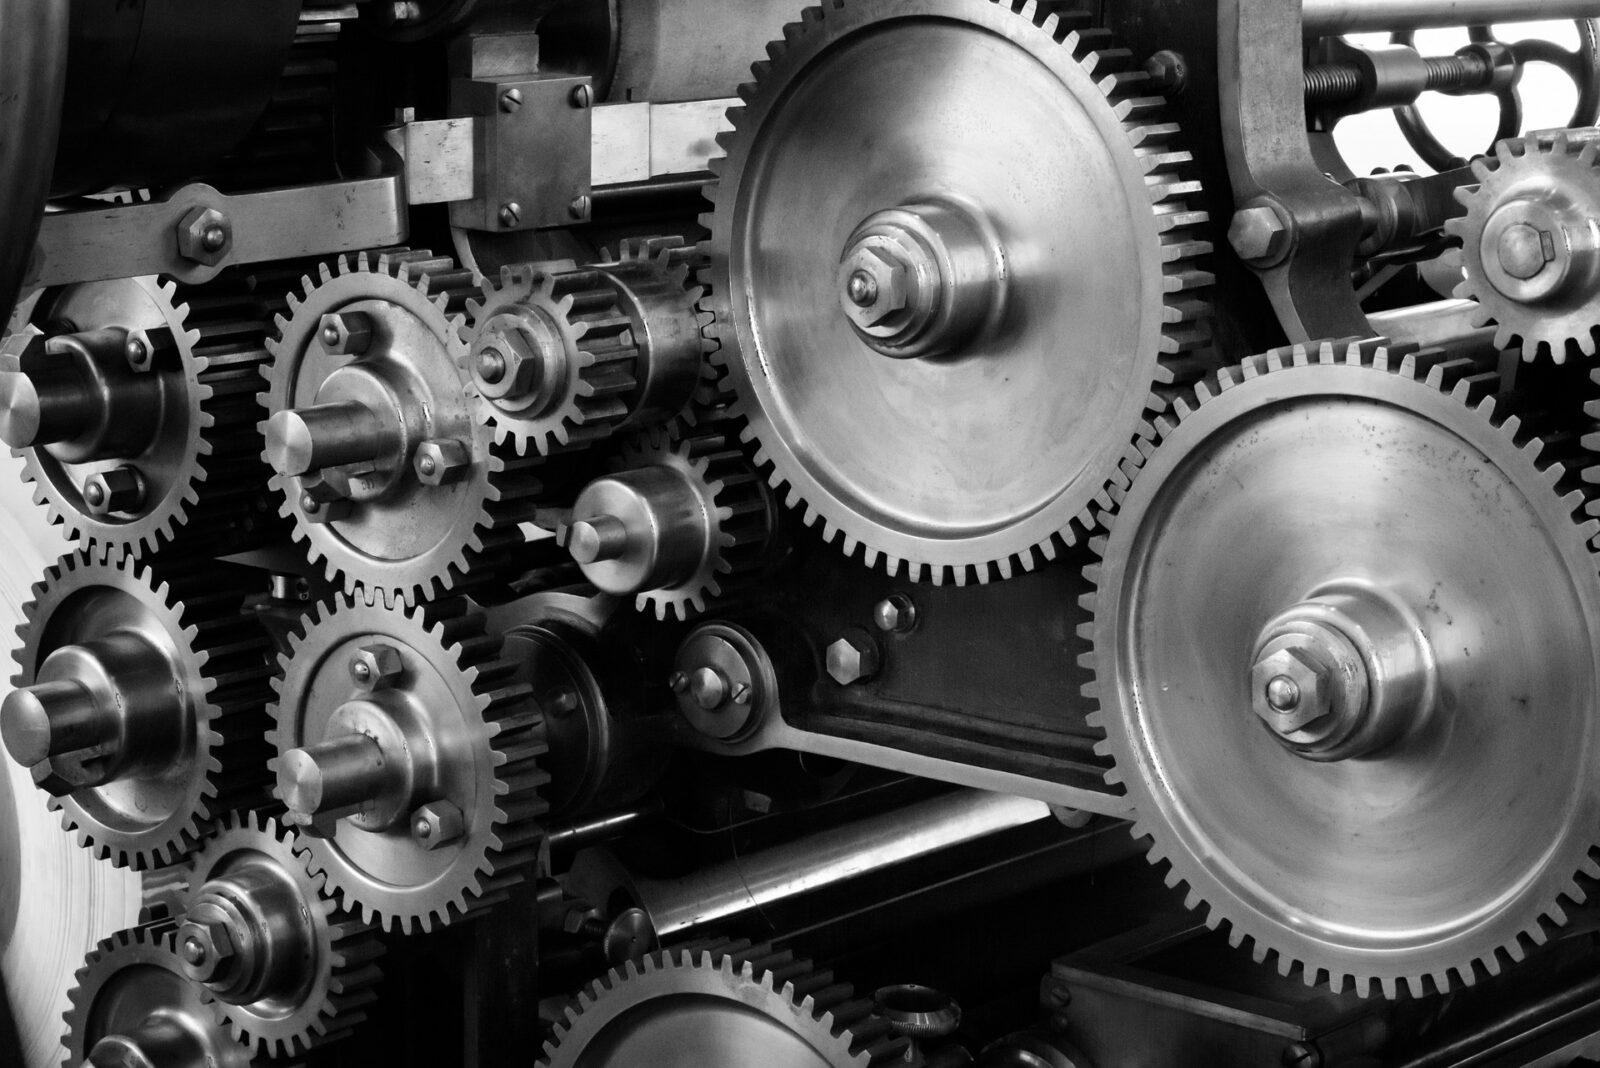 Multiple mechanical gears